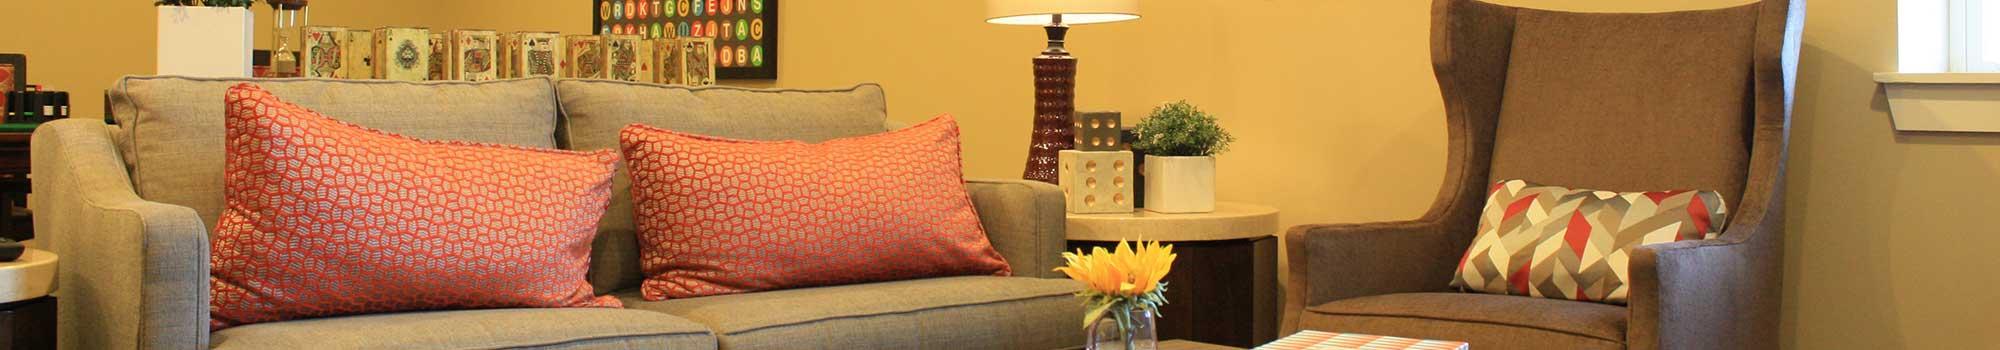 Pathway senior living corporate blog